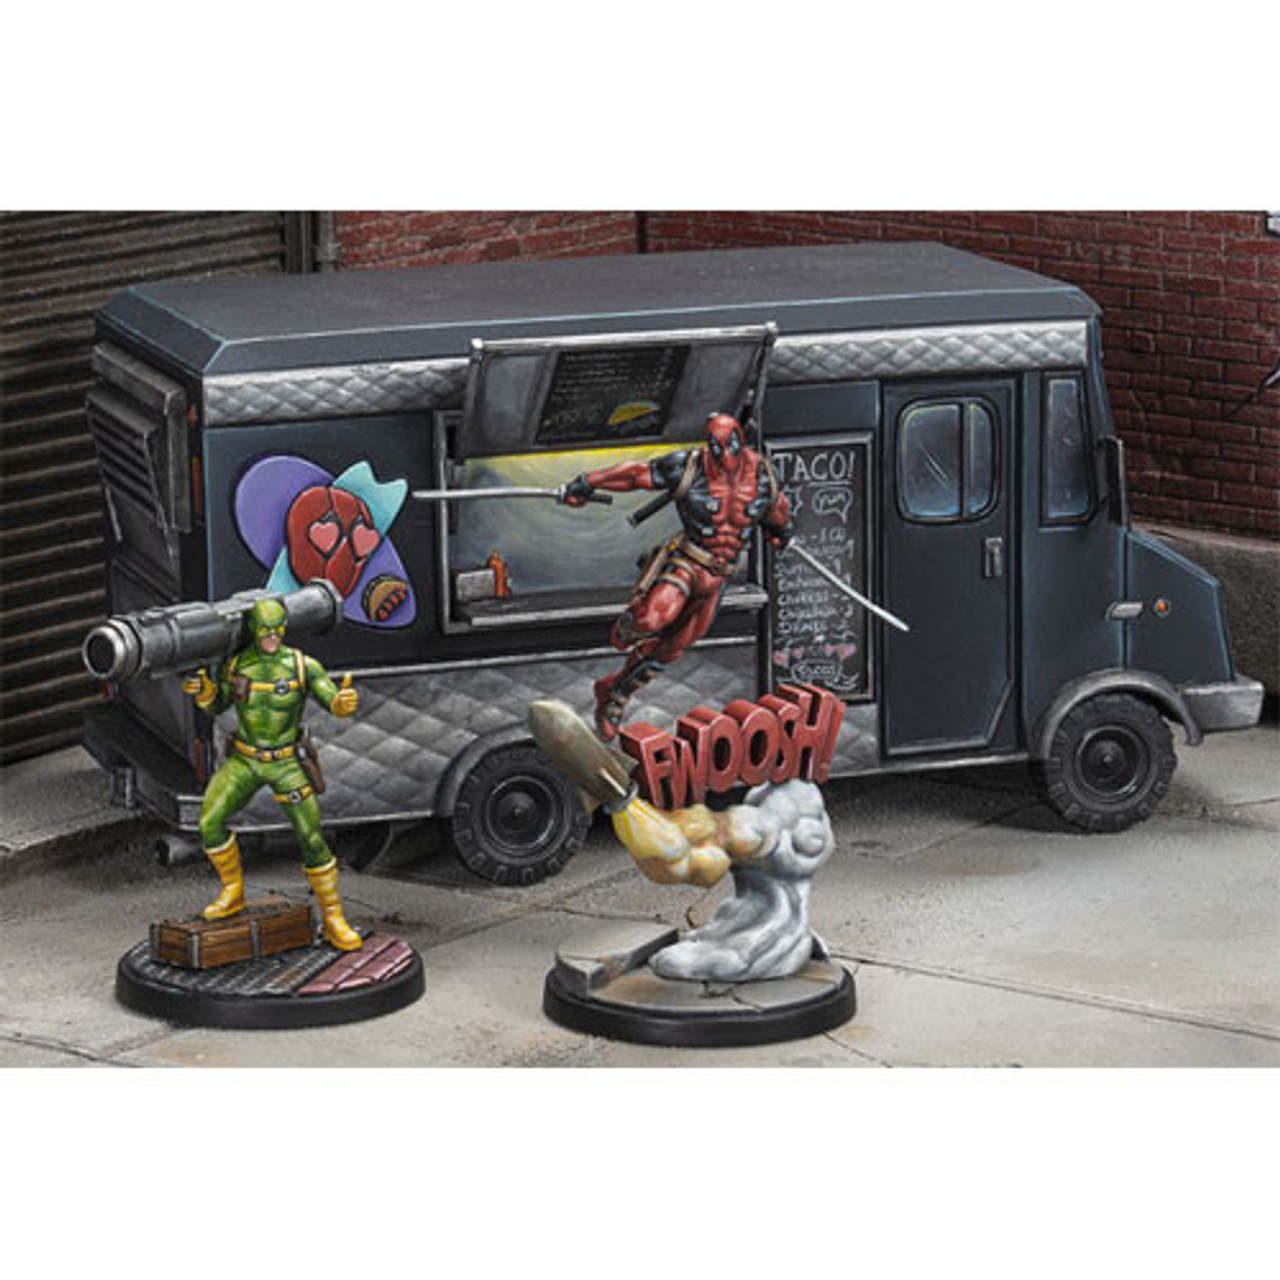 Marvel Crisis Protocol - Deadpool & Bob & Taco Truck Character Pack